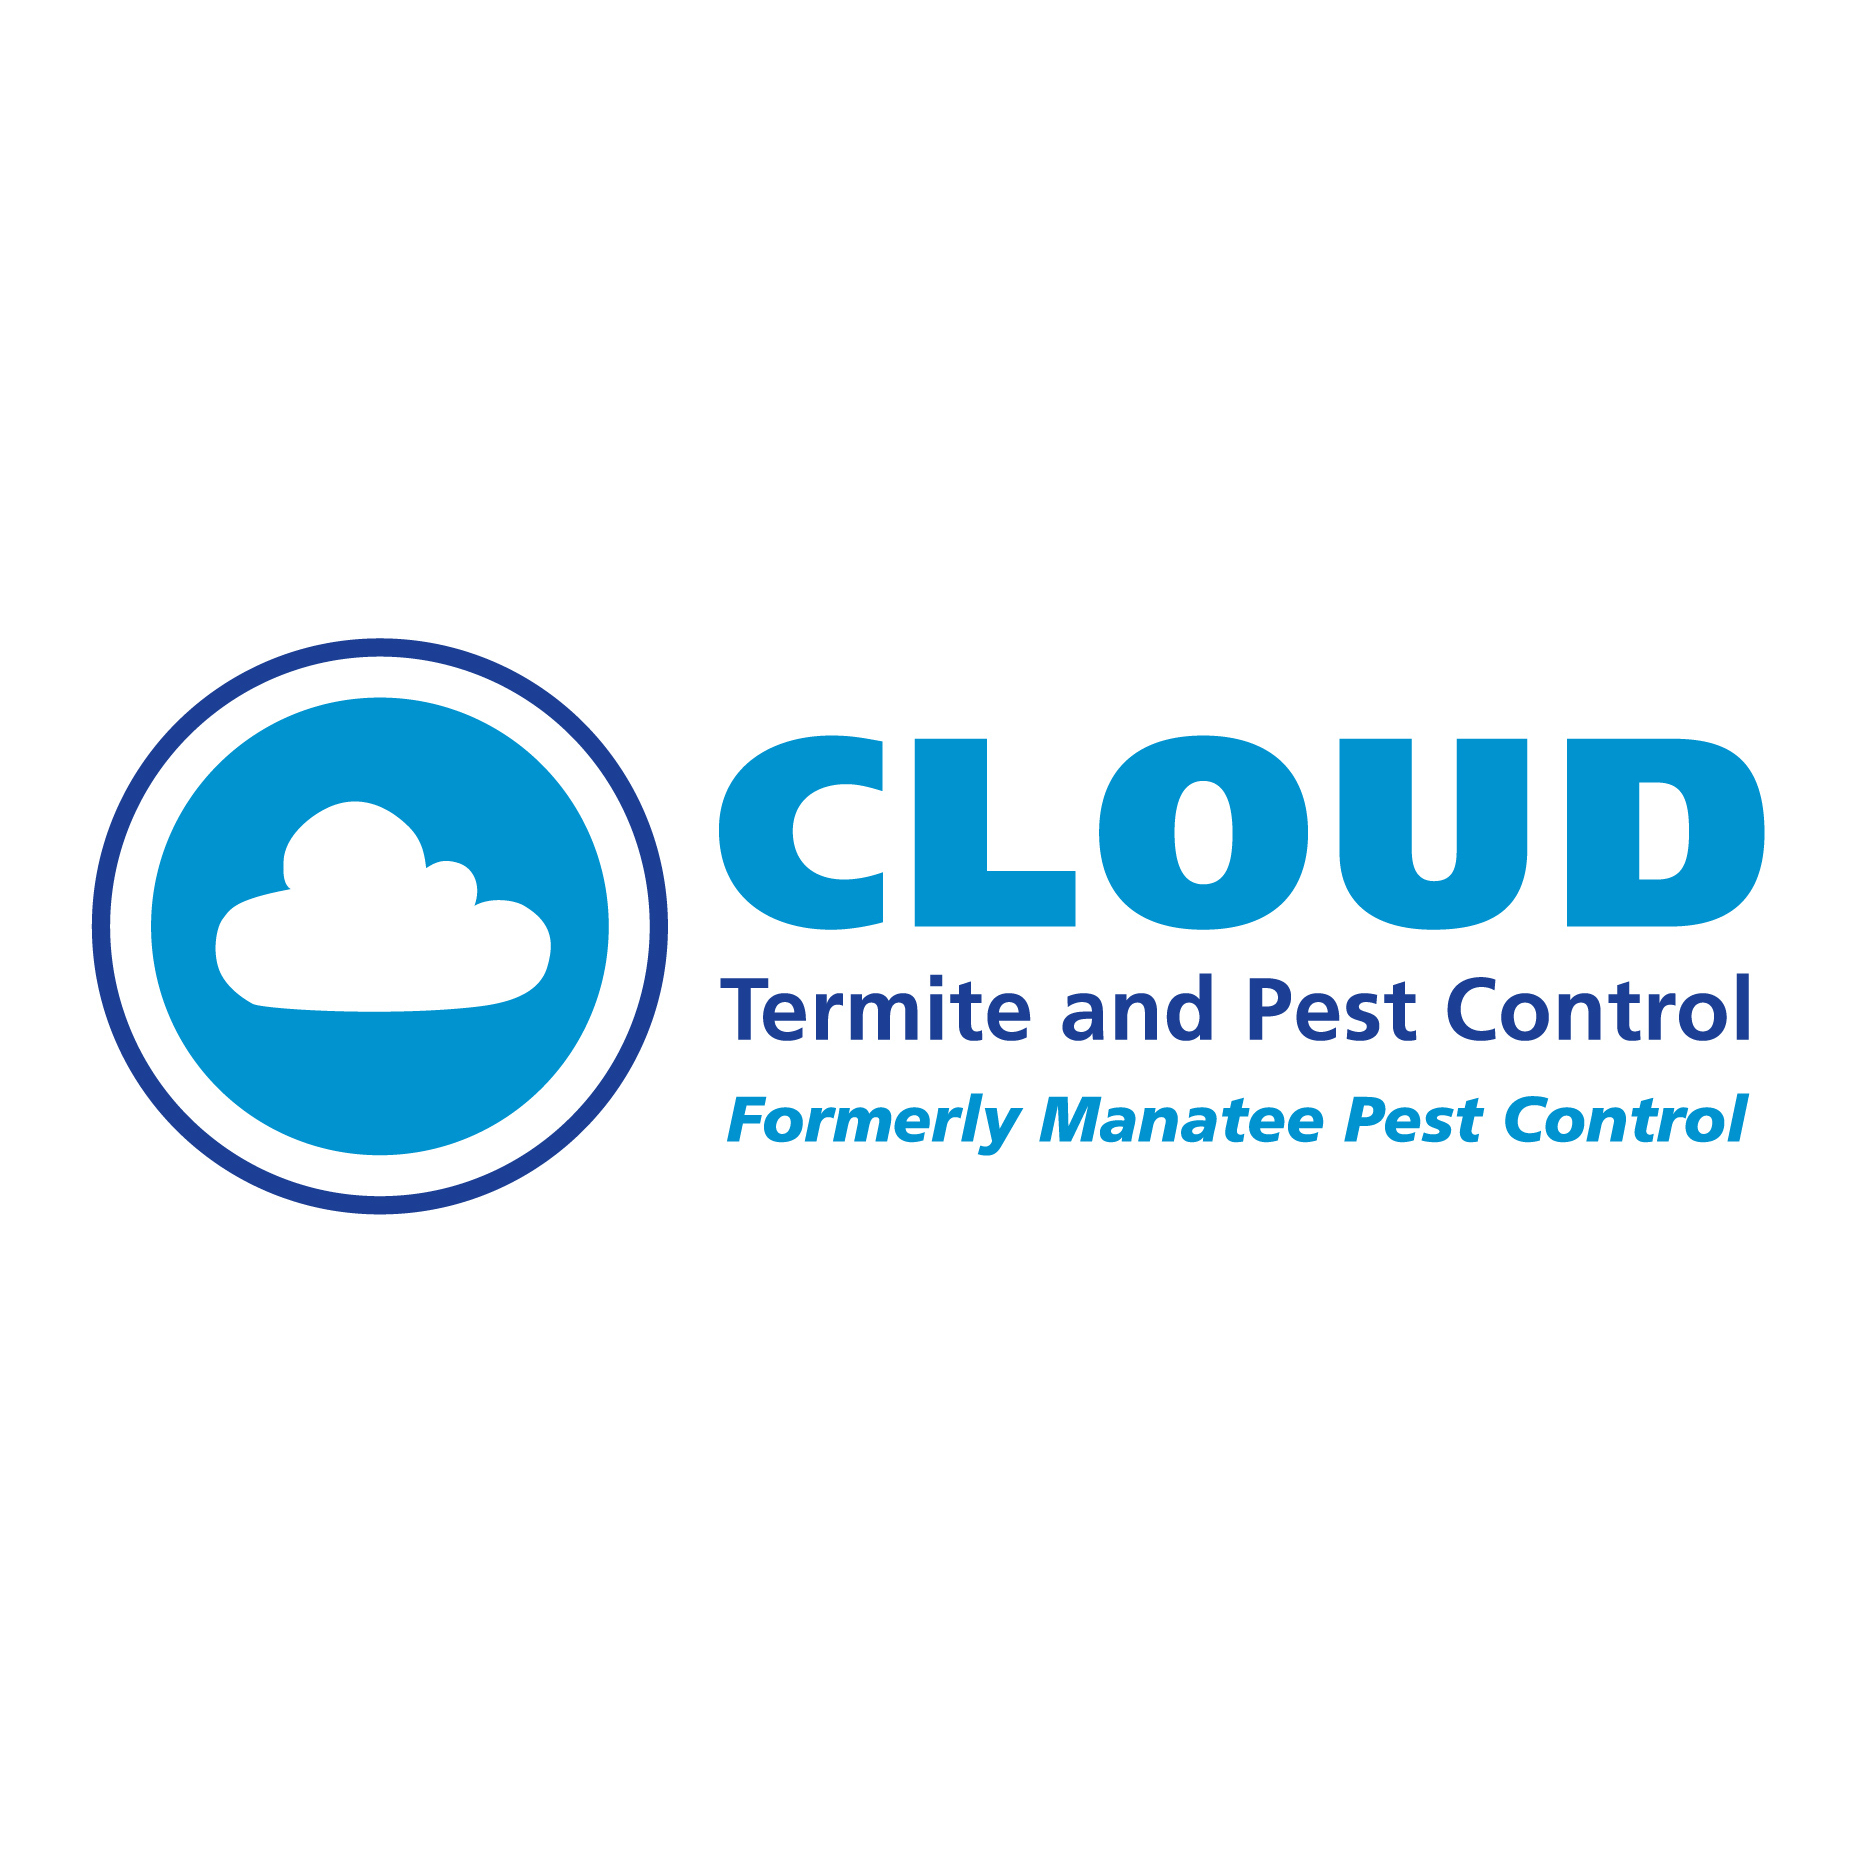 Manatee pest control